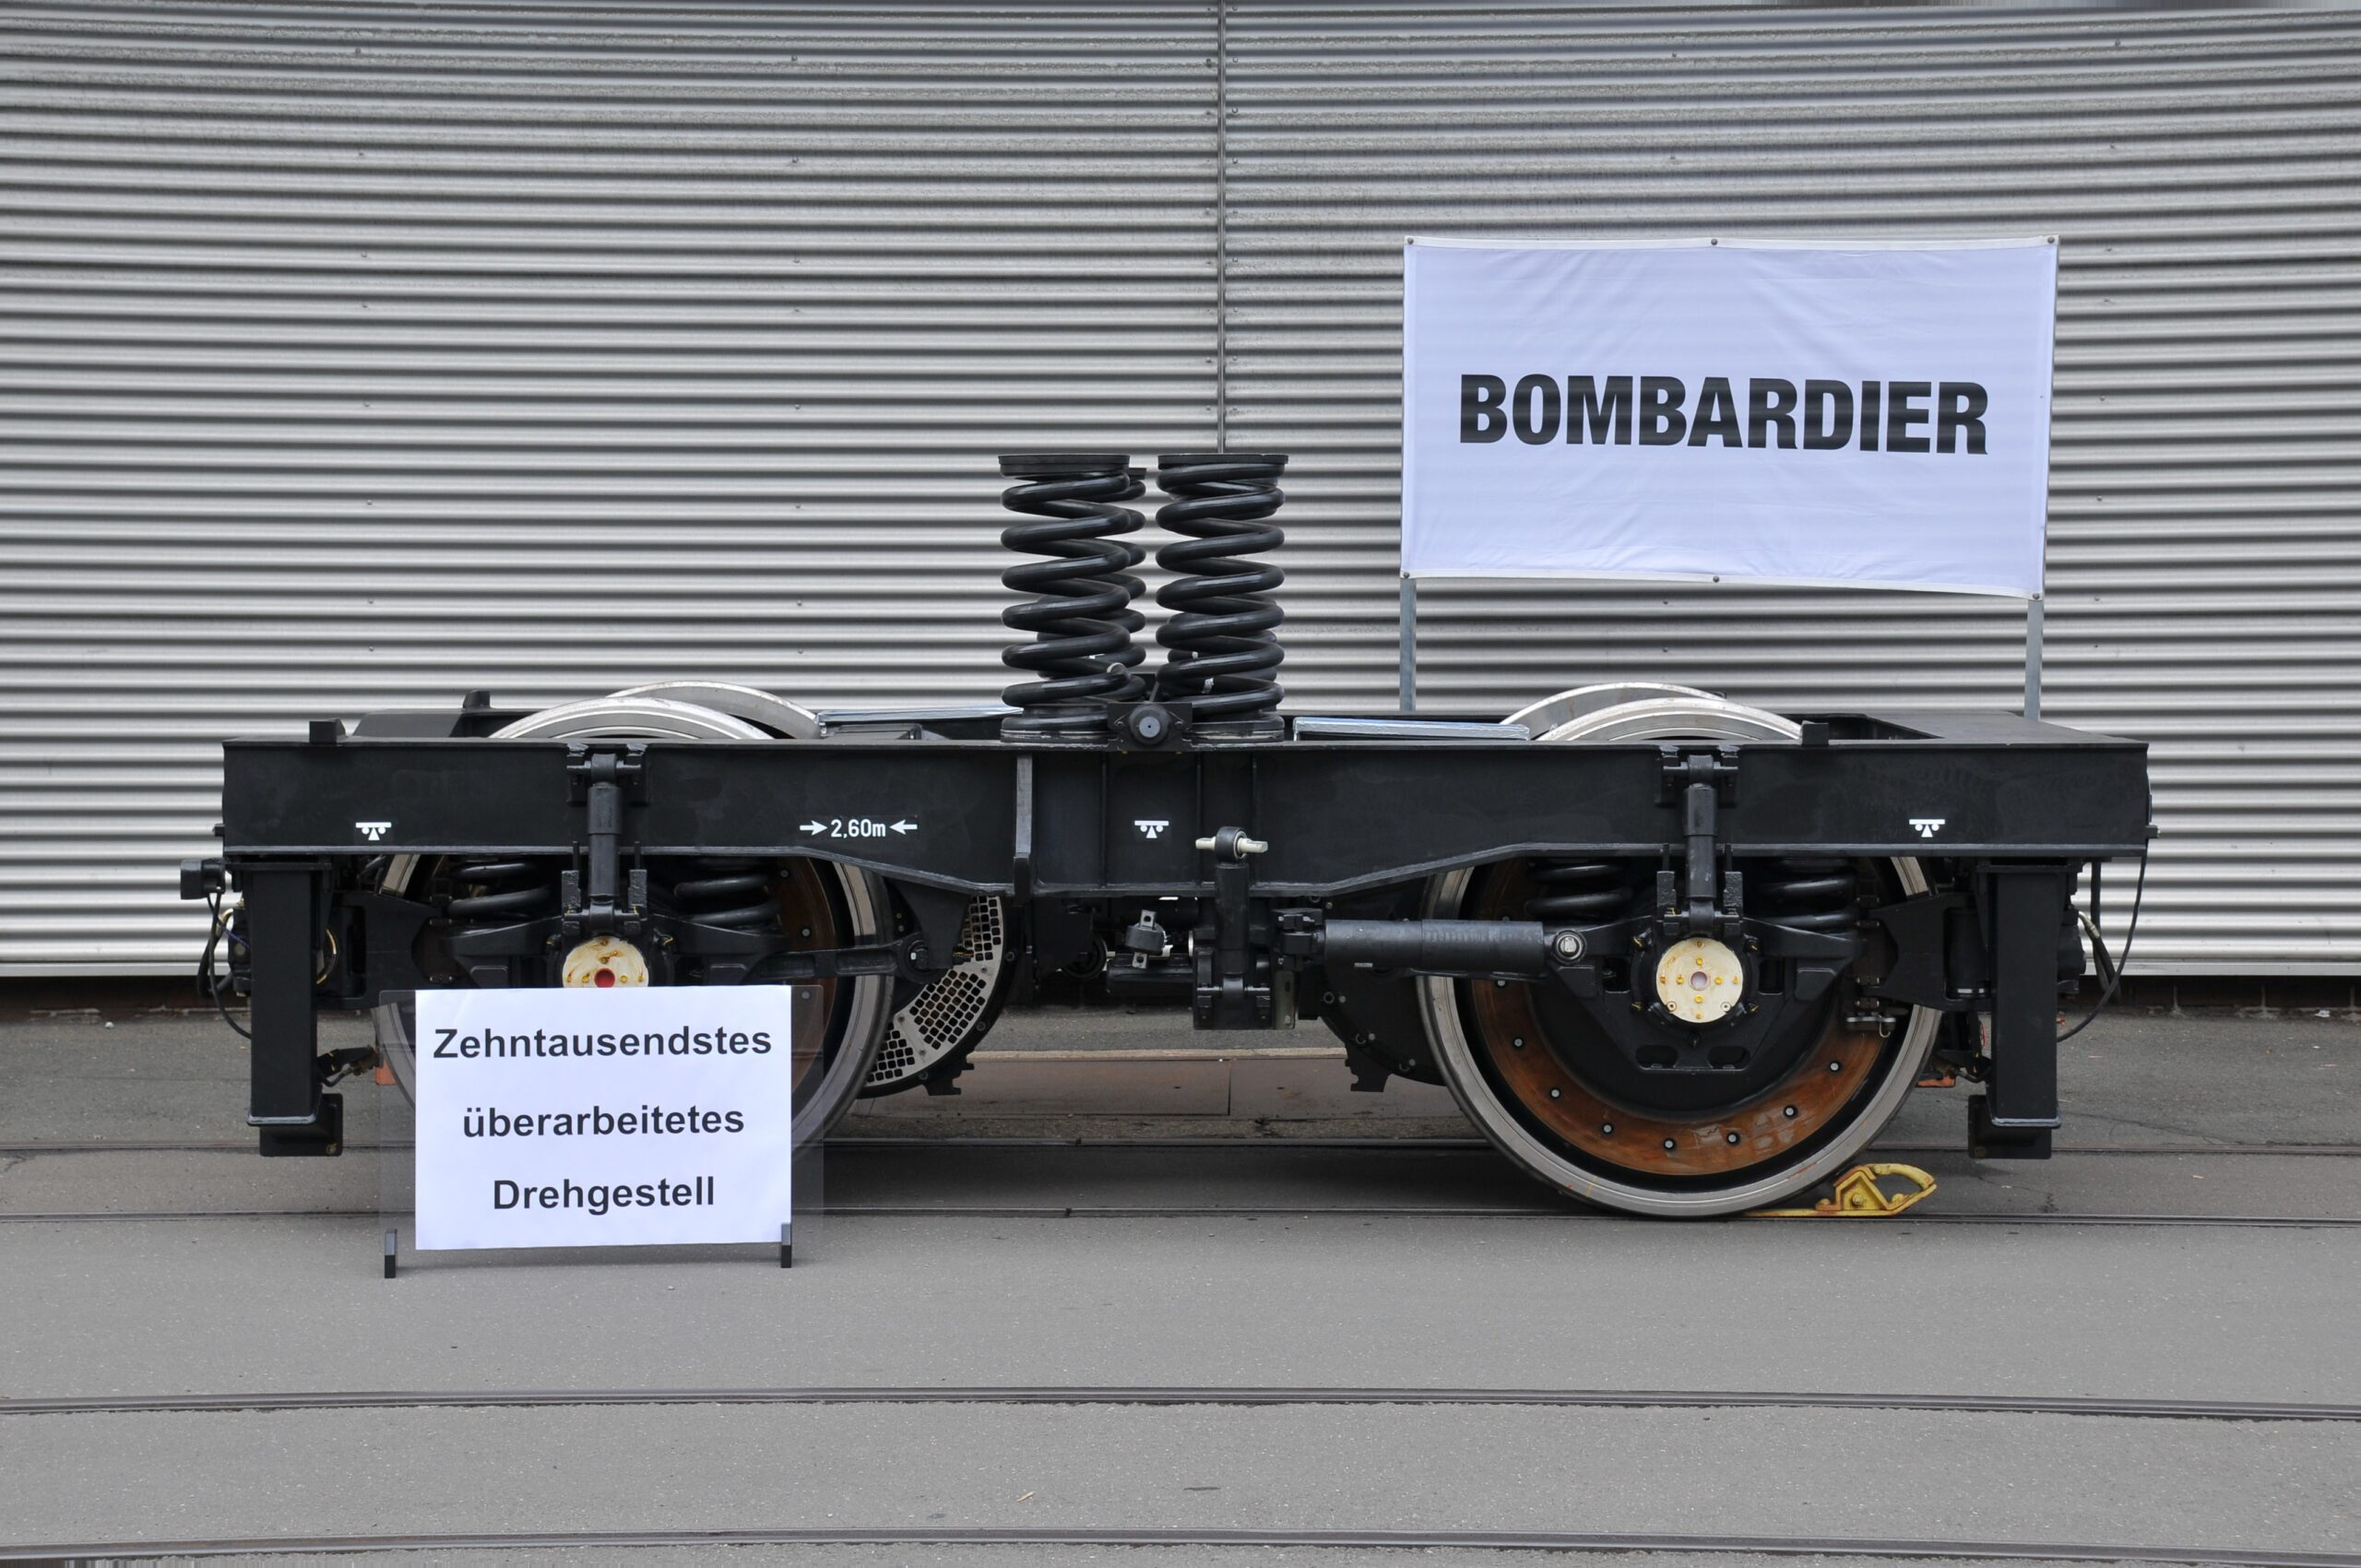 Bombardier's bogie competence centre in Siegen, Germany overhauls its 10,000th bogie